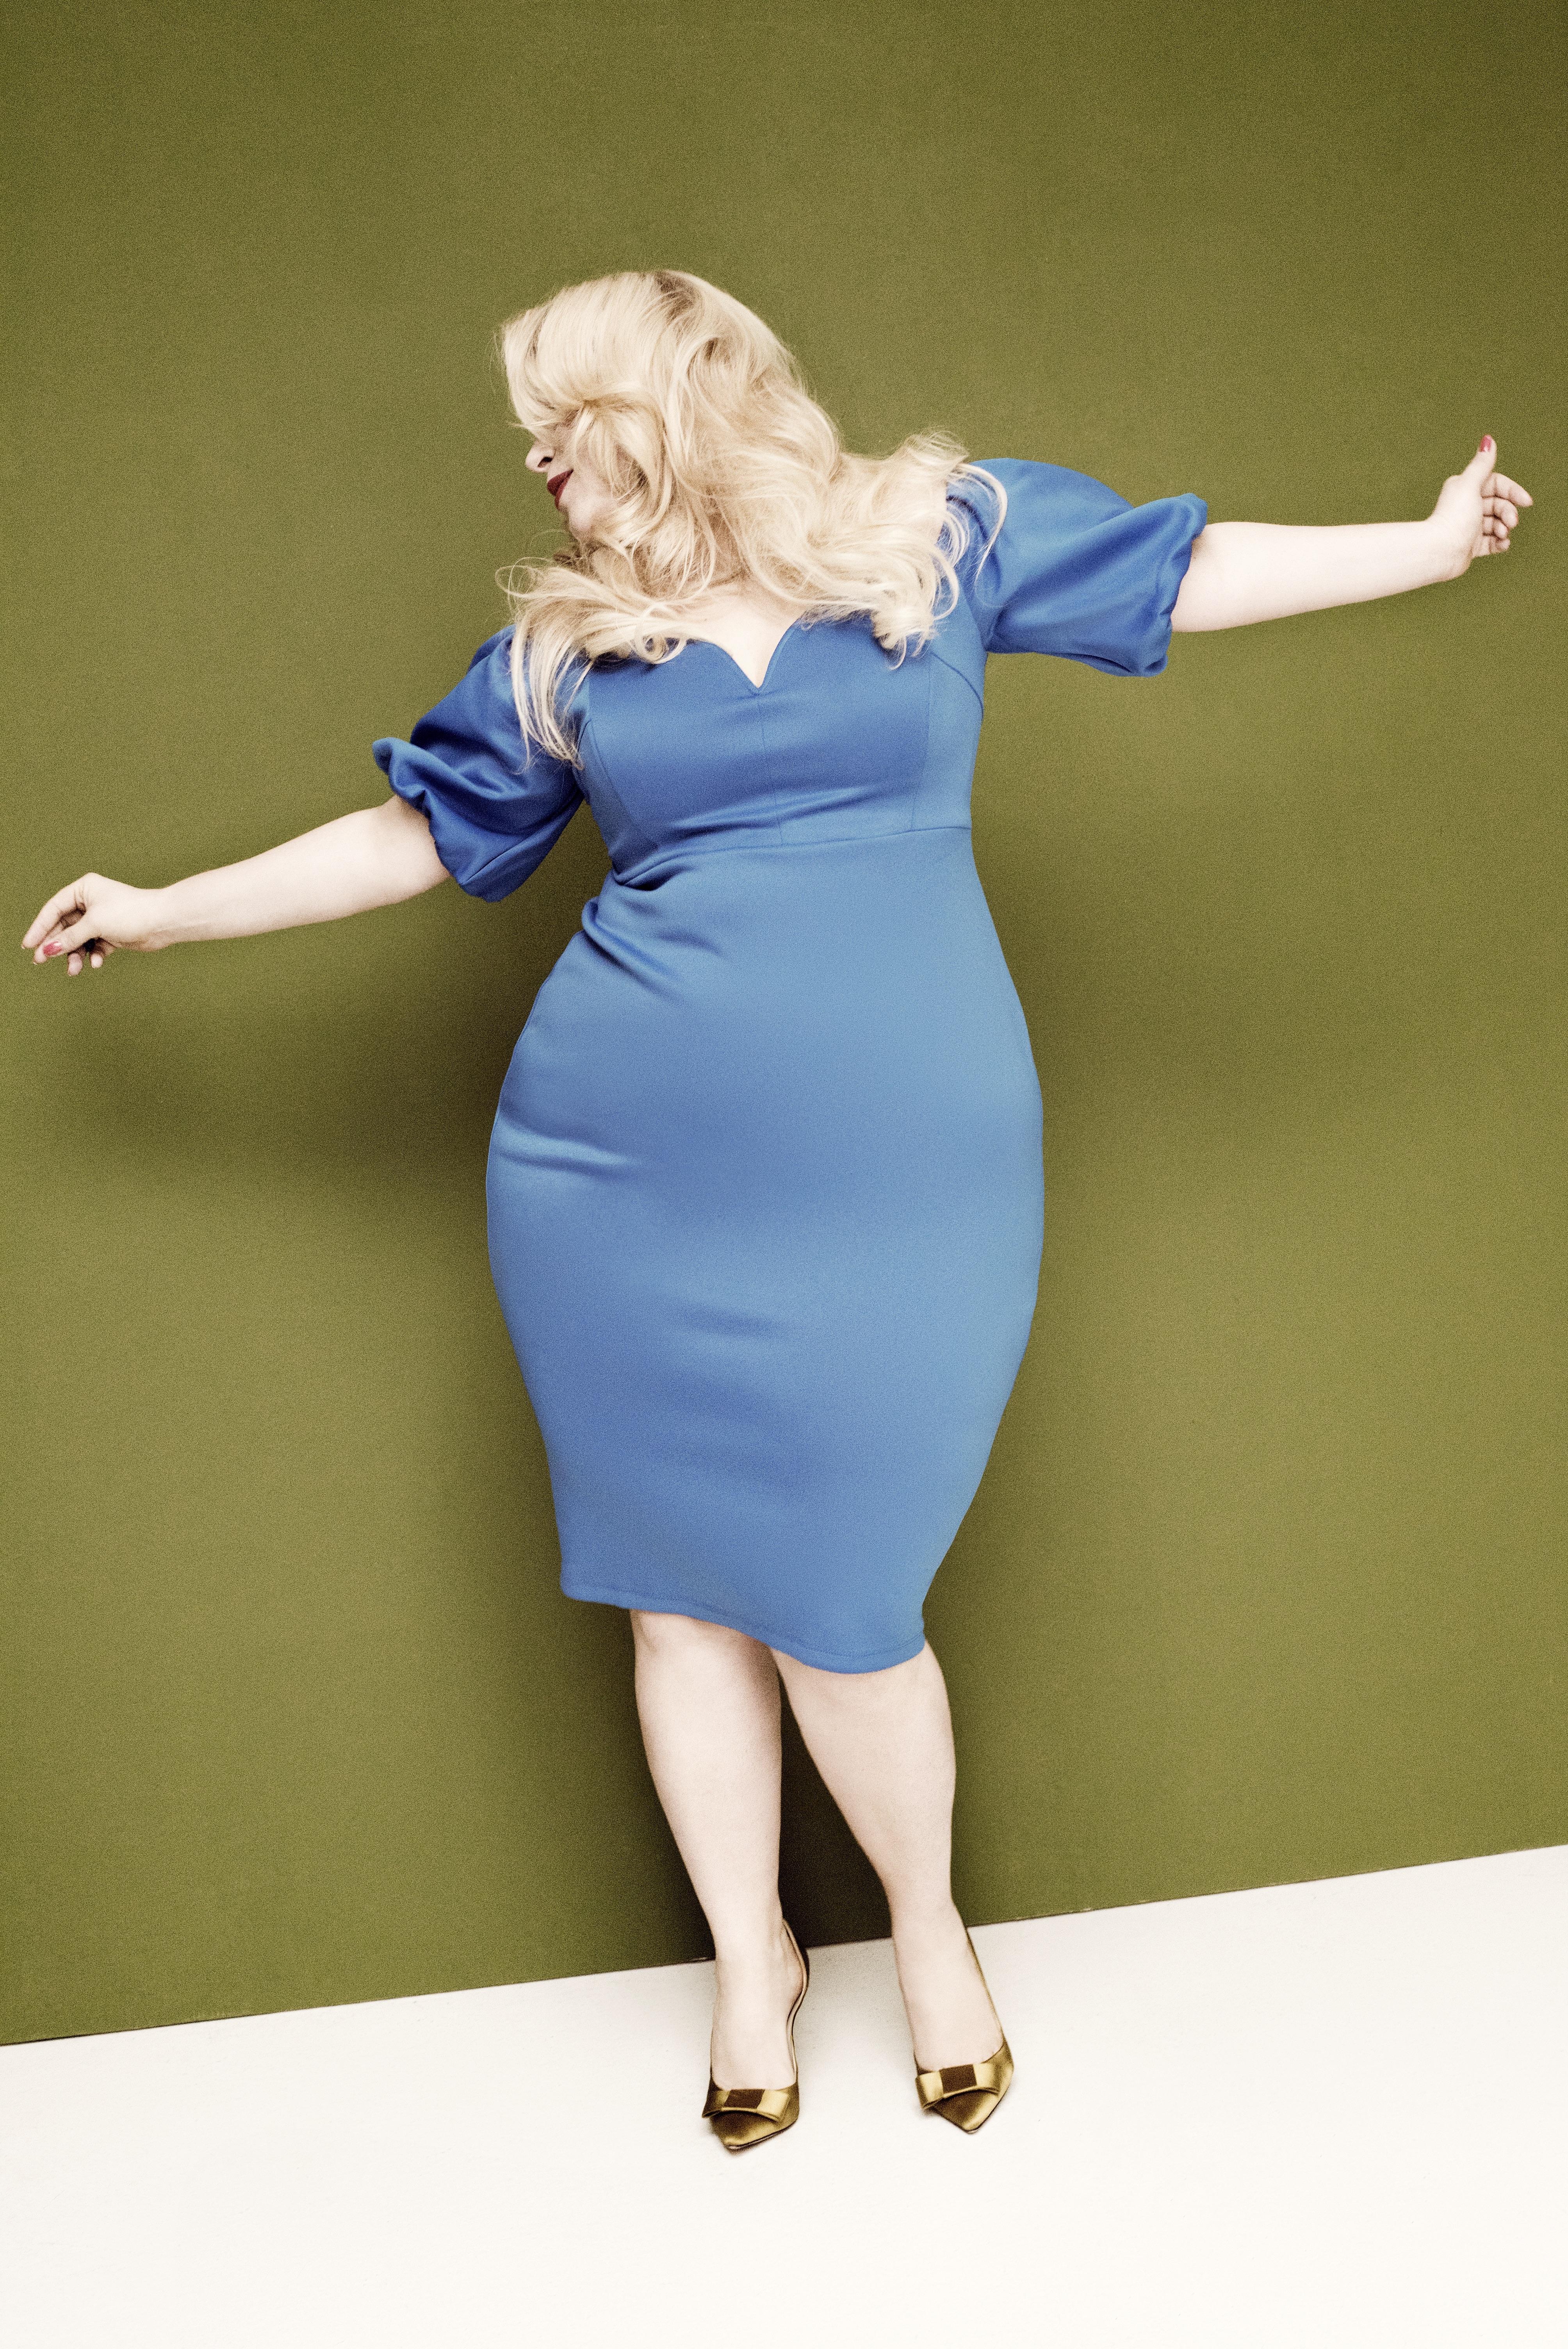 fashionweek-berlin-Caterina-pogorzelski-curvy-magazine-norbert-hurle-Plus-size-Model-curvy